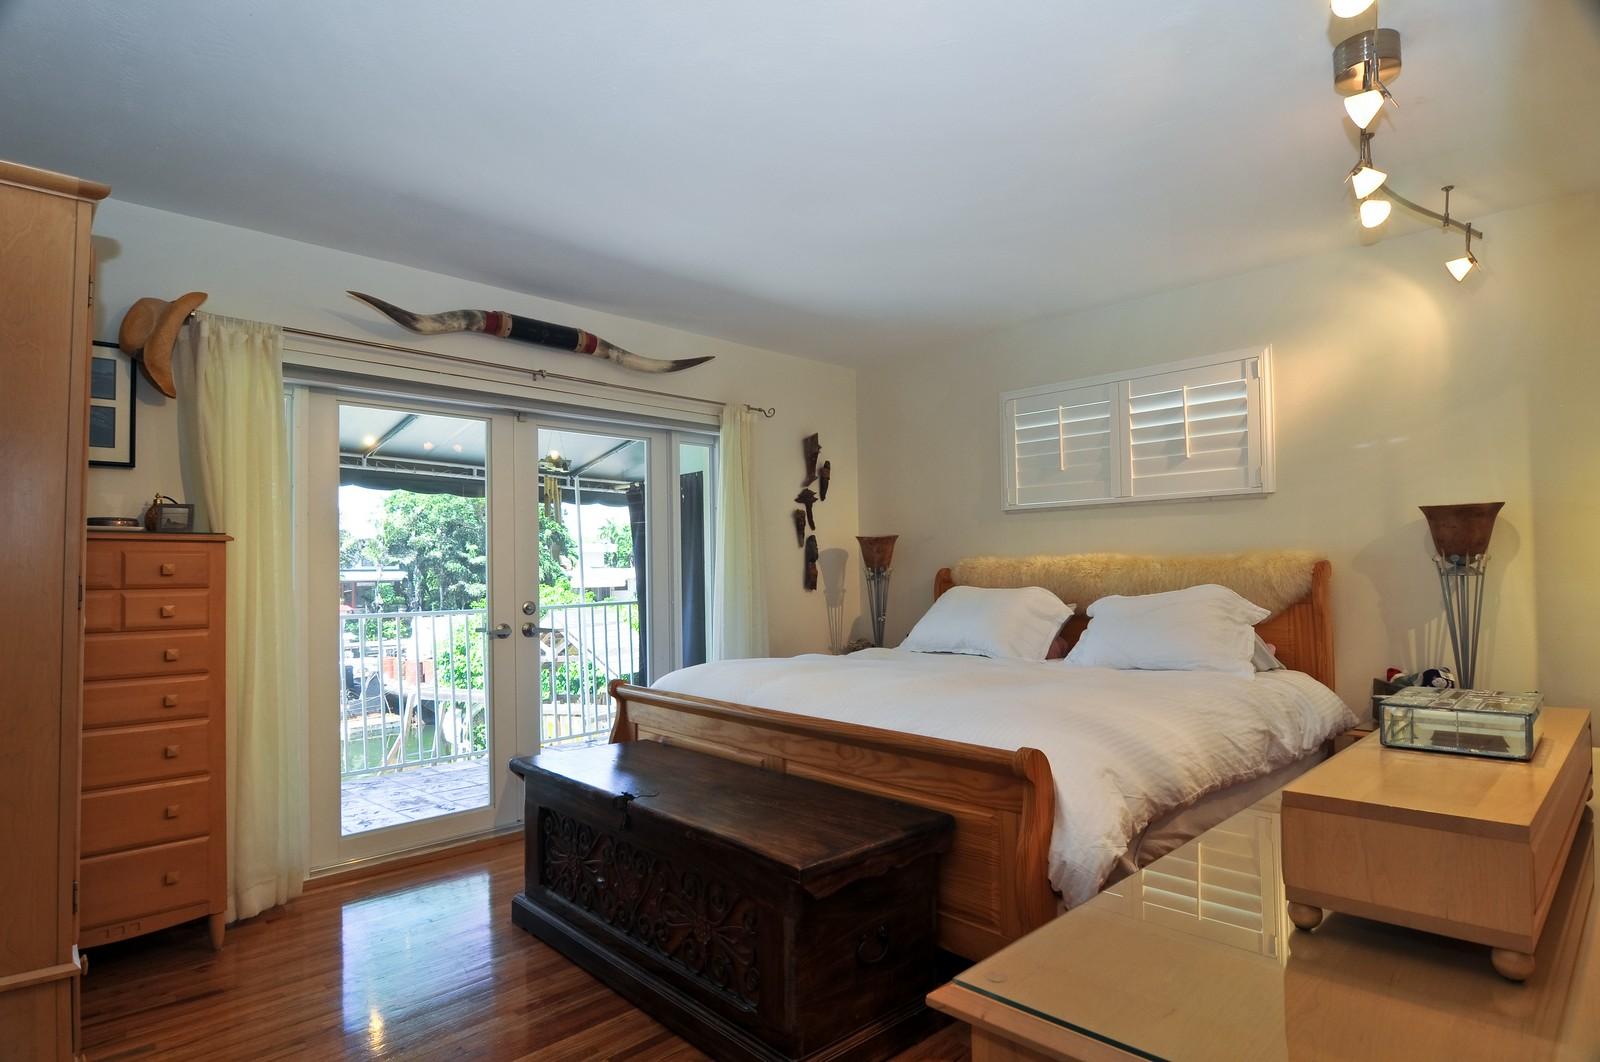 Real Estate Photography - 2010 NE 121st Rd, Miami, FL, 33181 - Master Bedroom